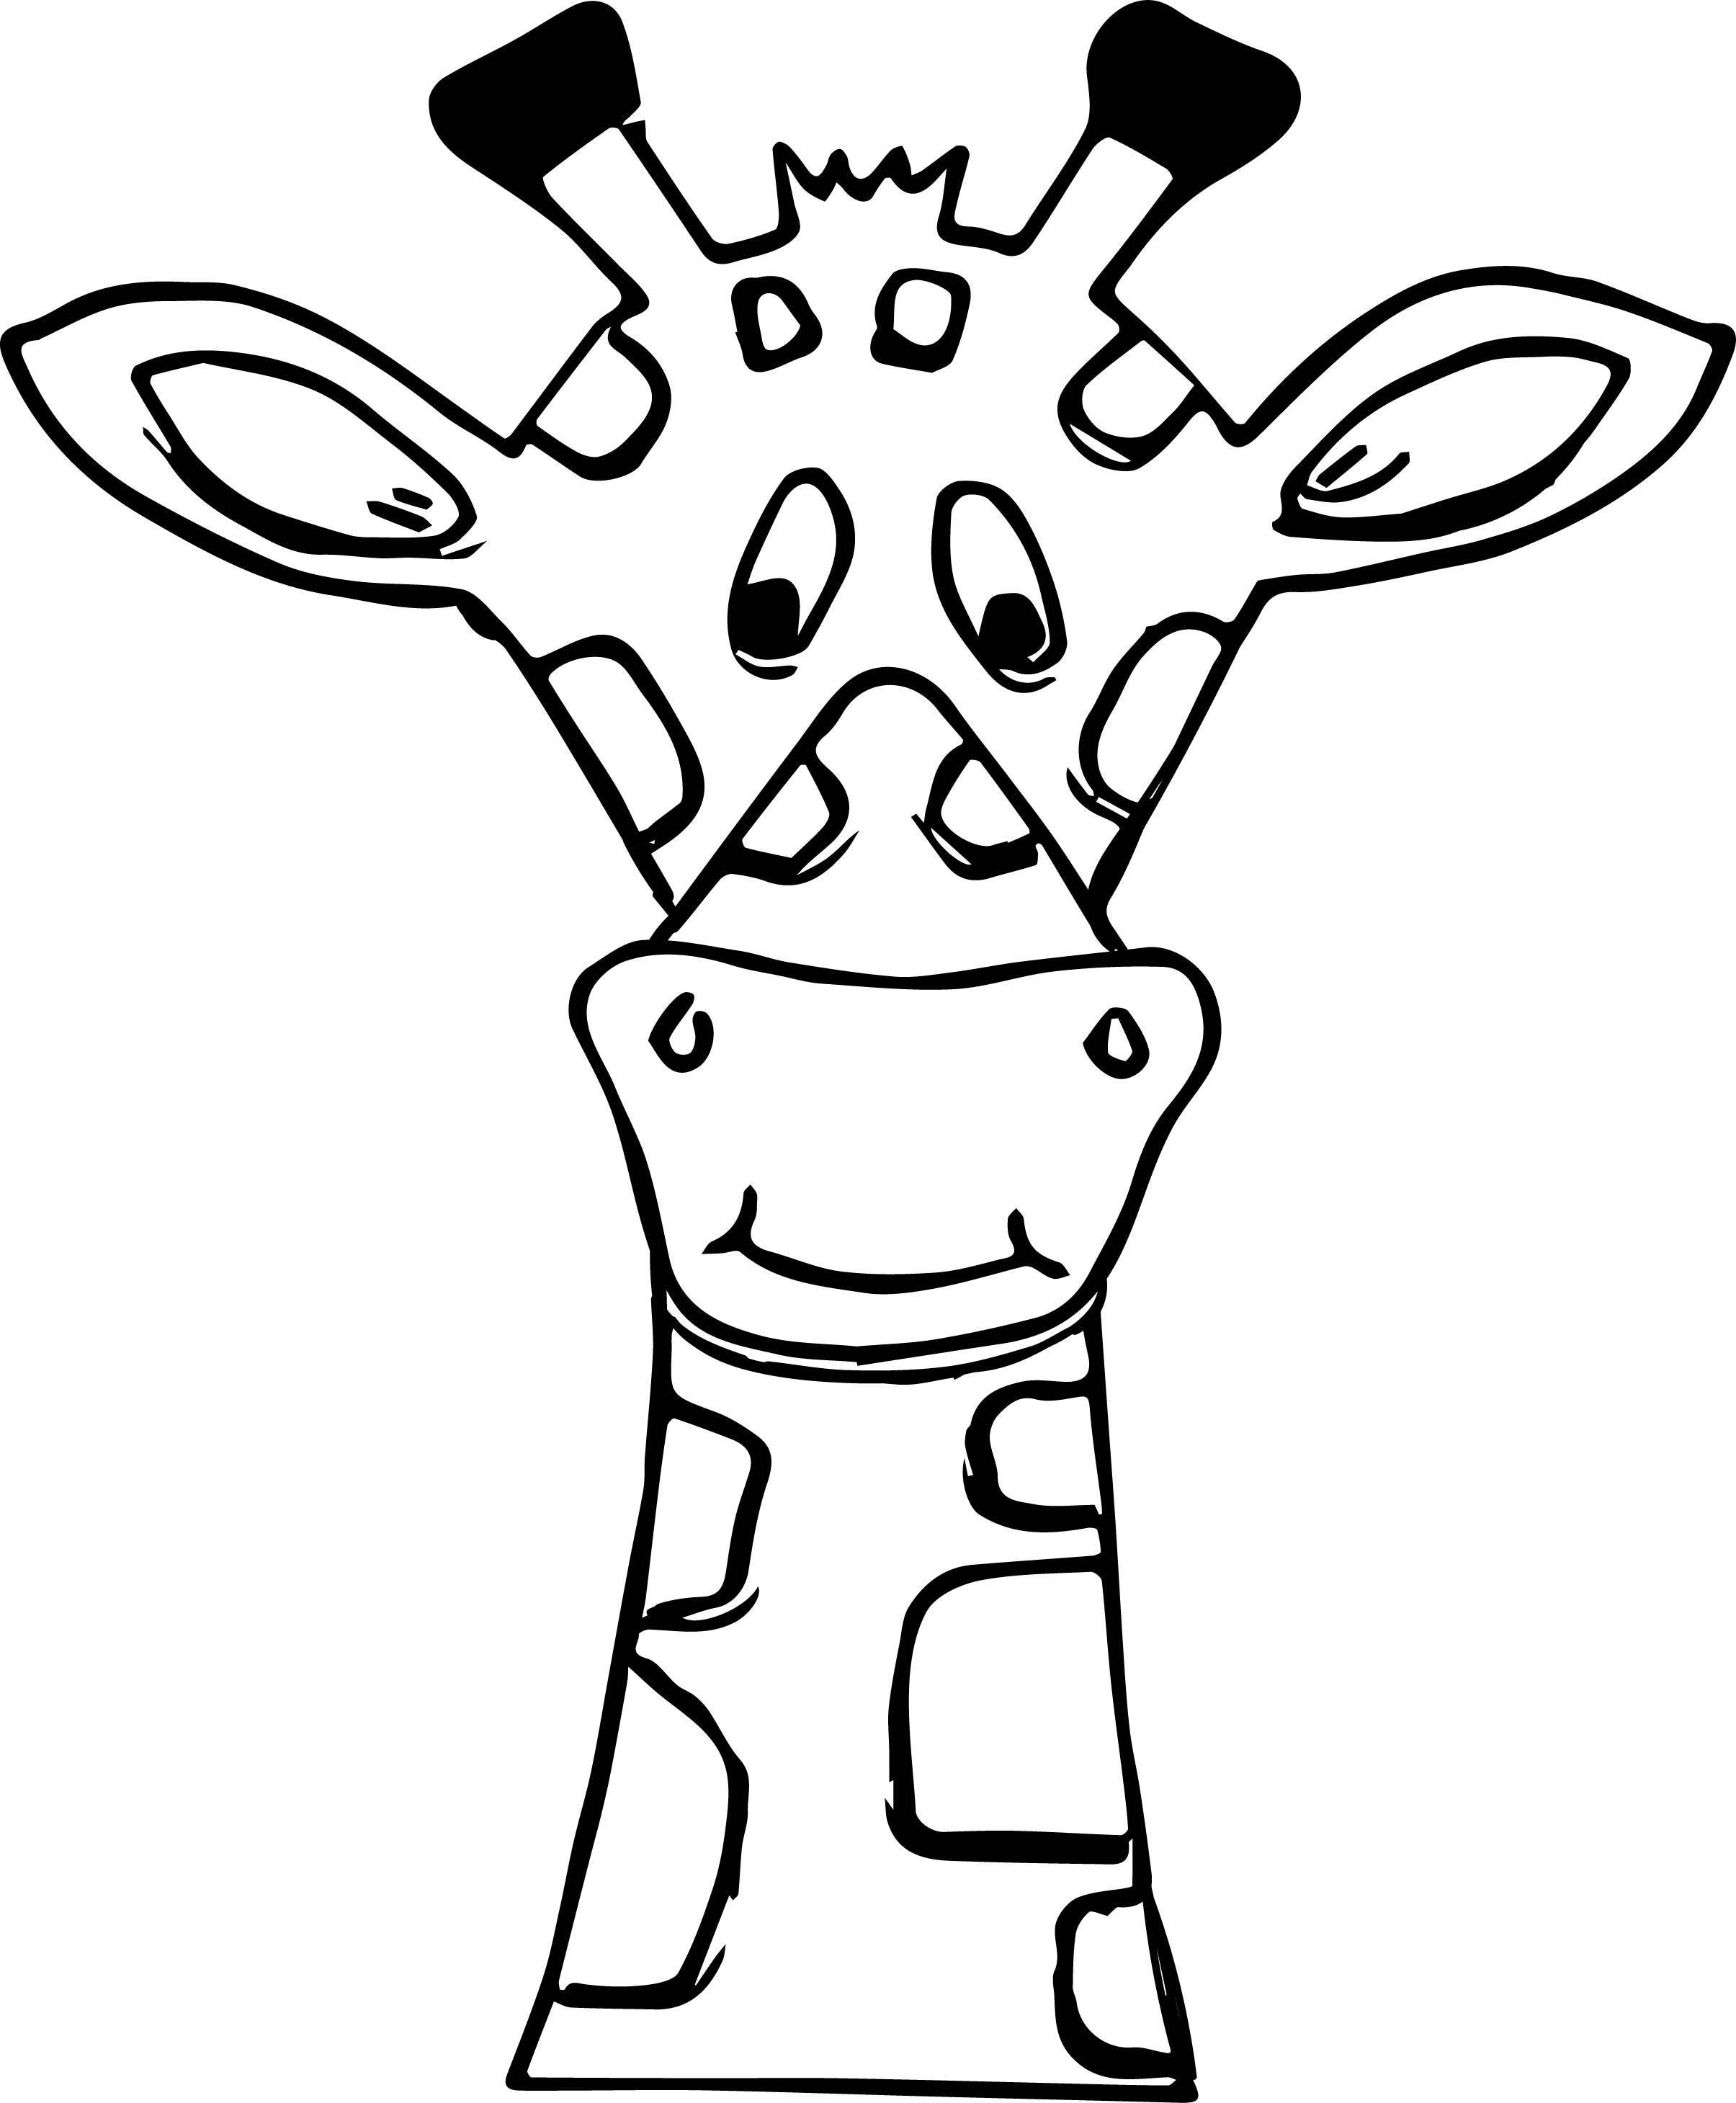 Cartoon Giraffe Face Coloring Page